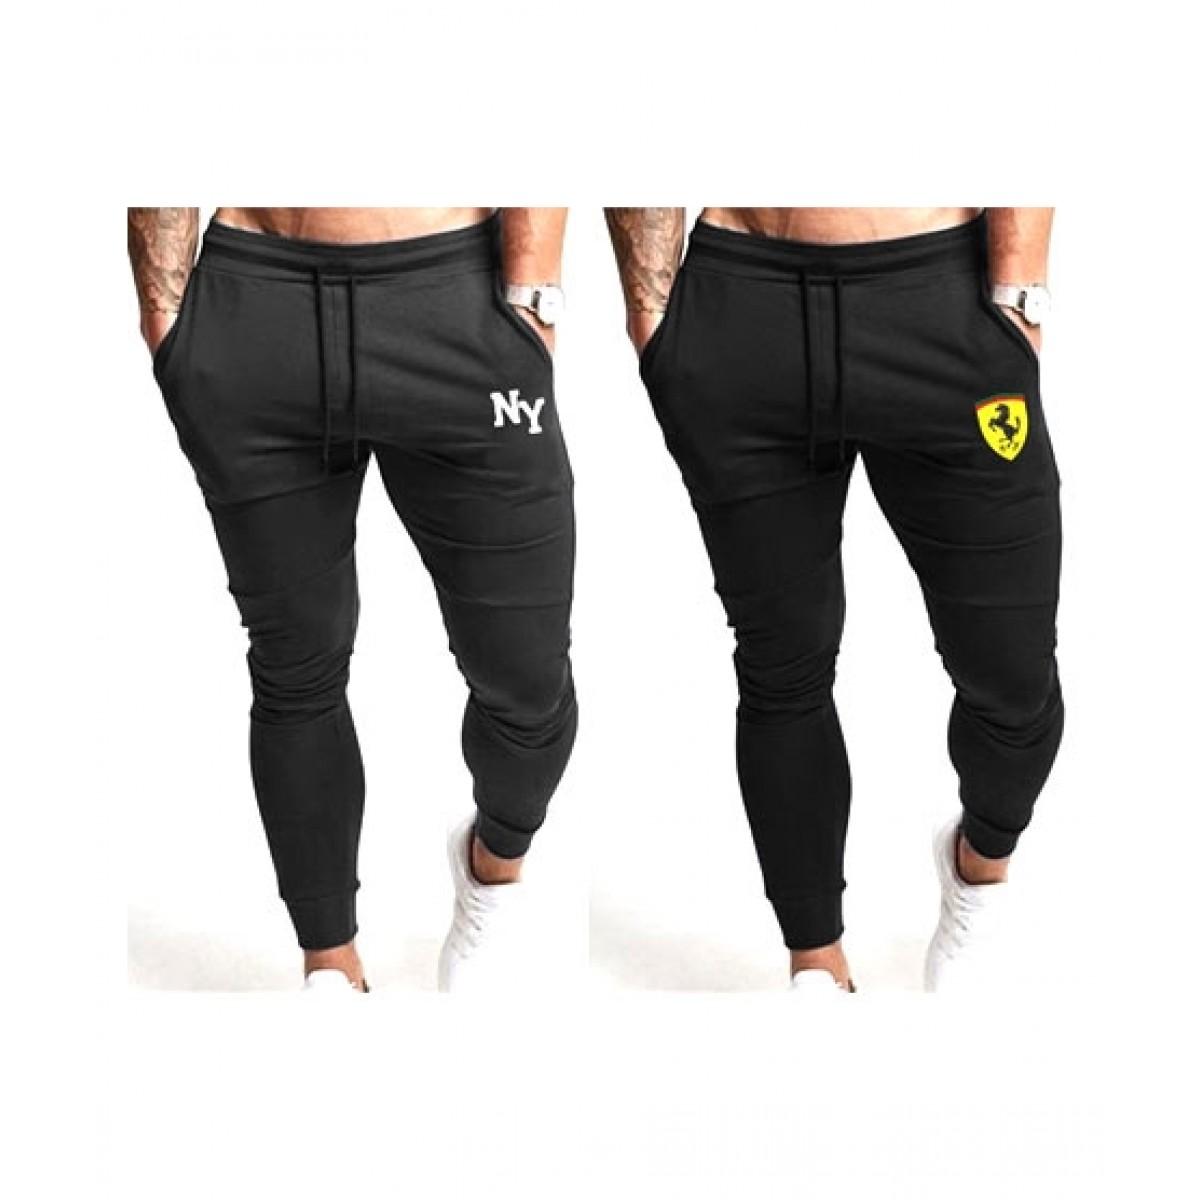 Jafri's Store Printed Fit Body Trouser For Men Pack of 2